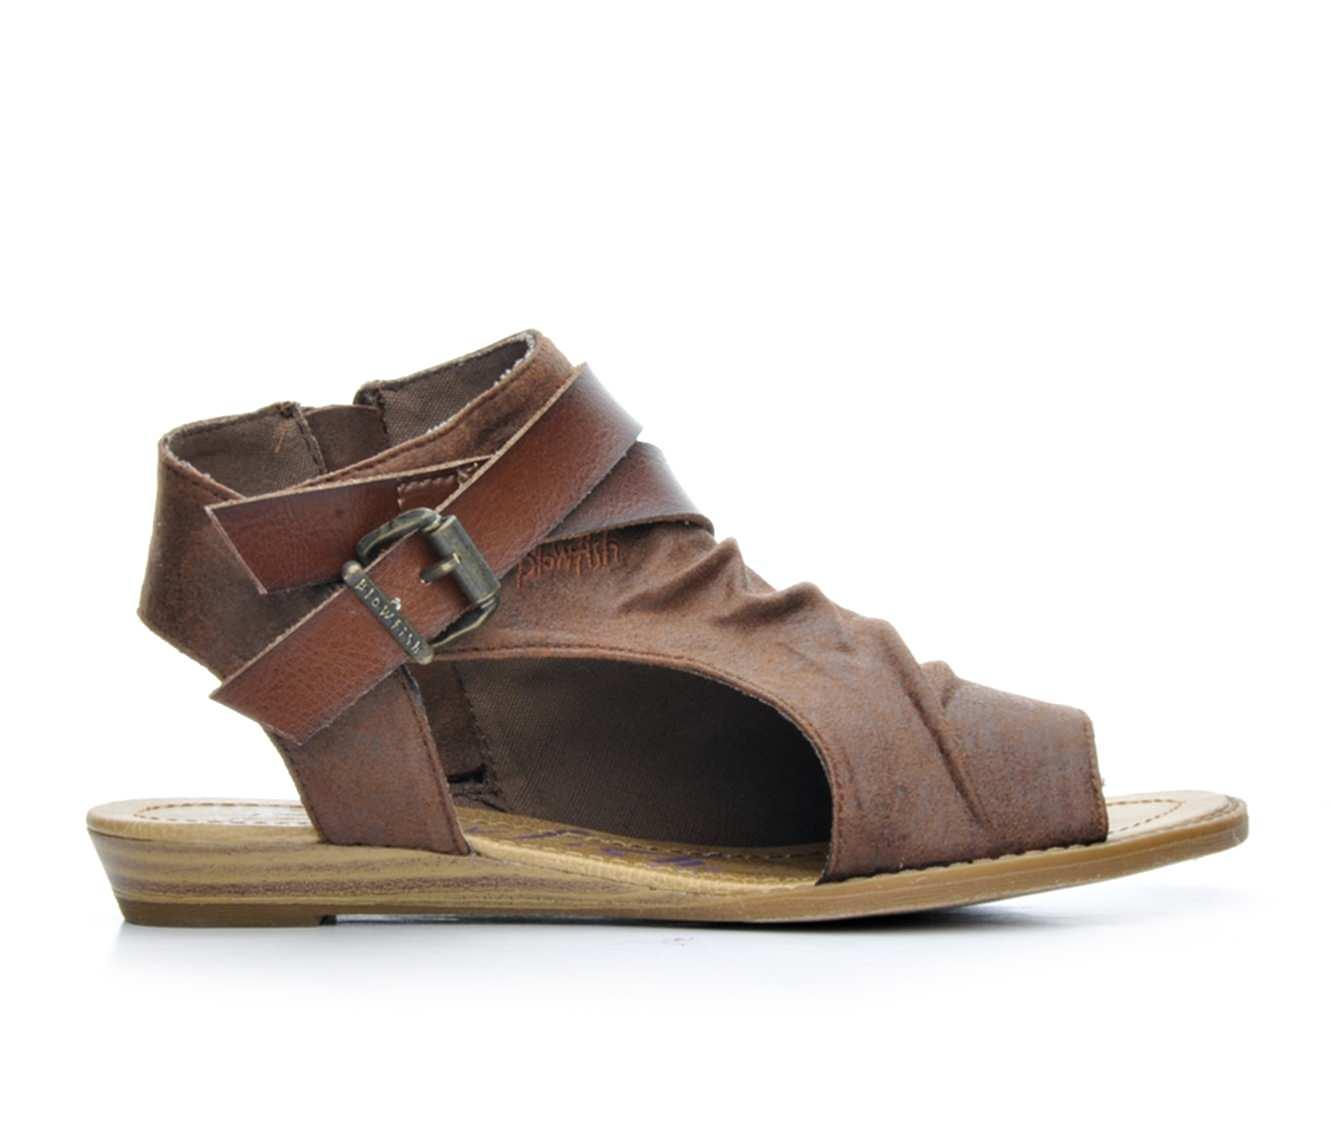 Women's Blowfish Malibu Balla Sandals (Brown)